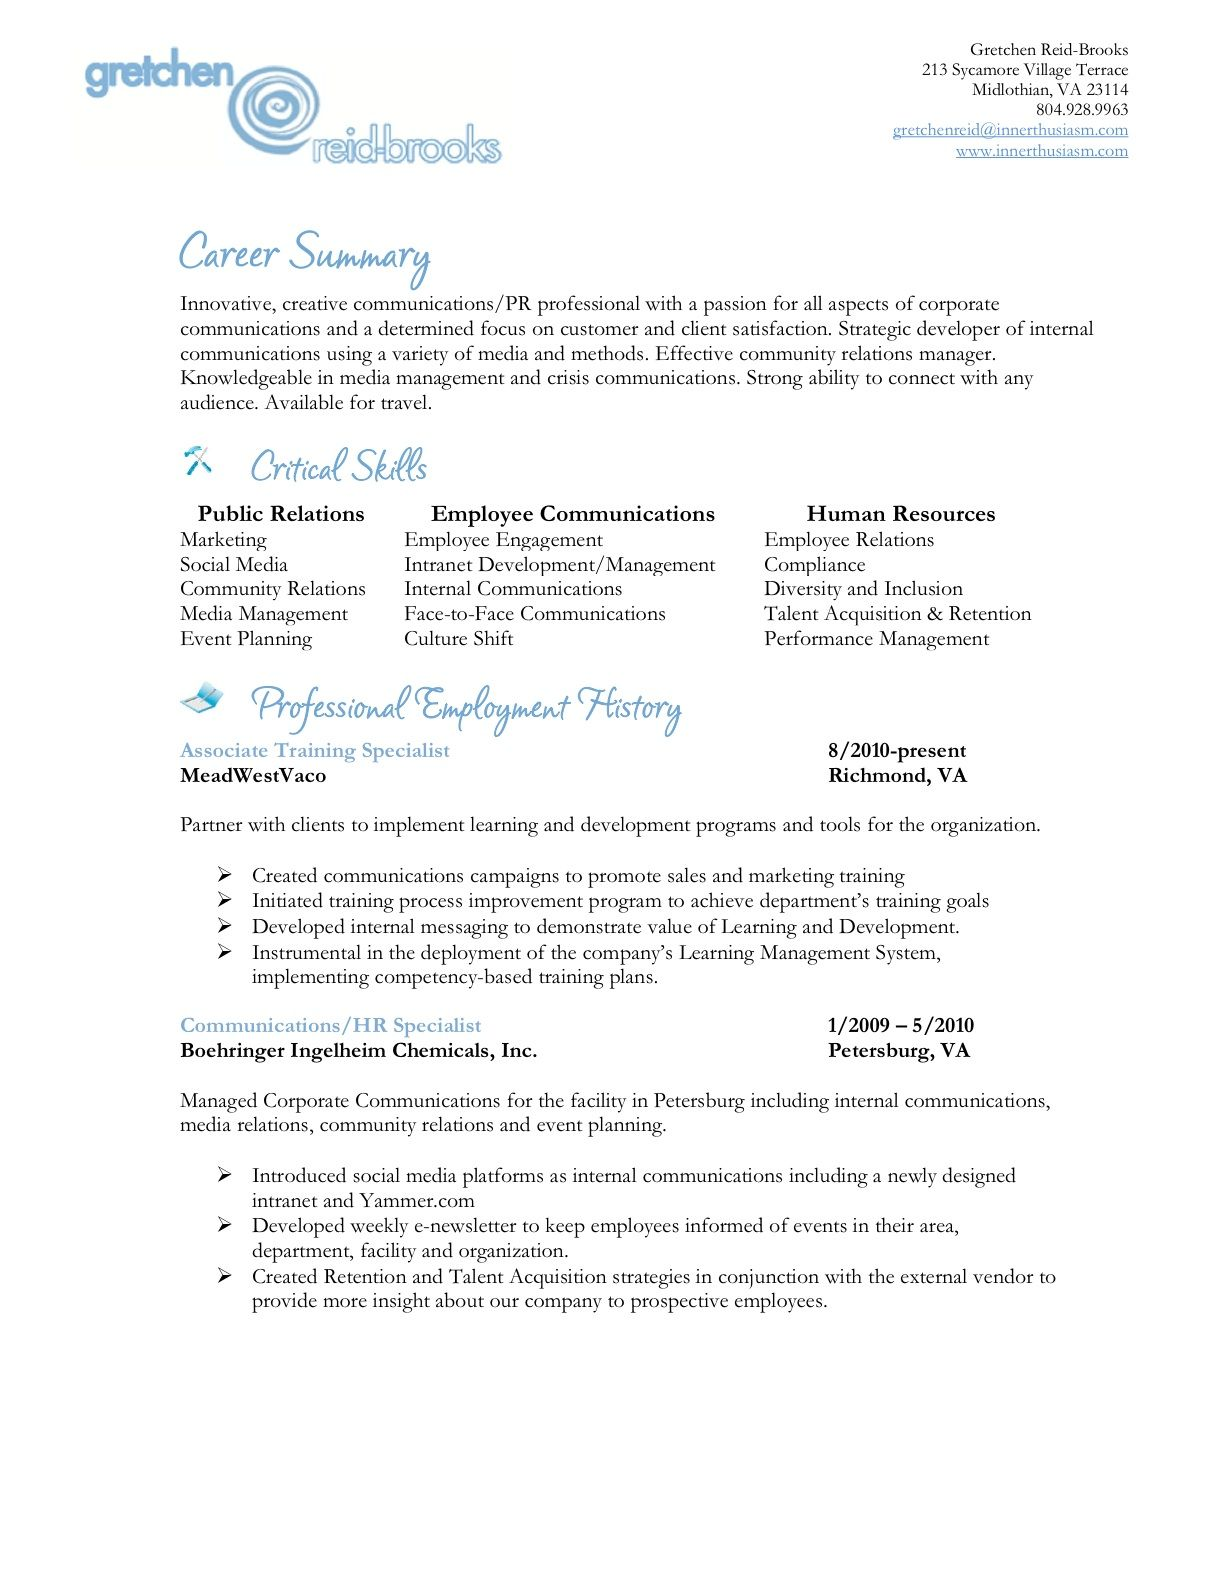 Innerthusiasm Welcome Innerthusiasm Resume Job Hunting Creative Communications